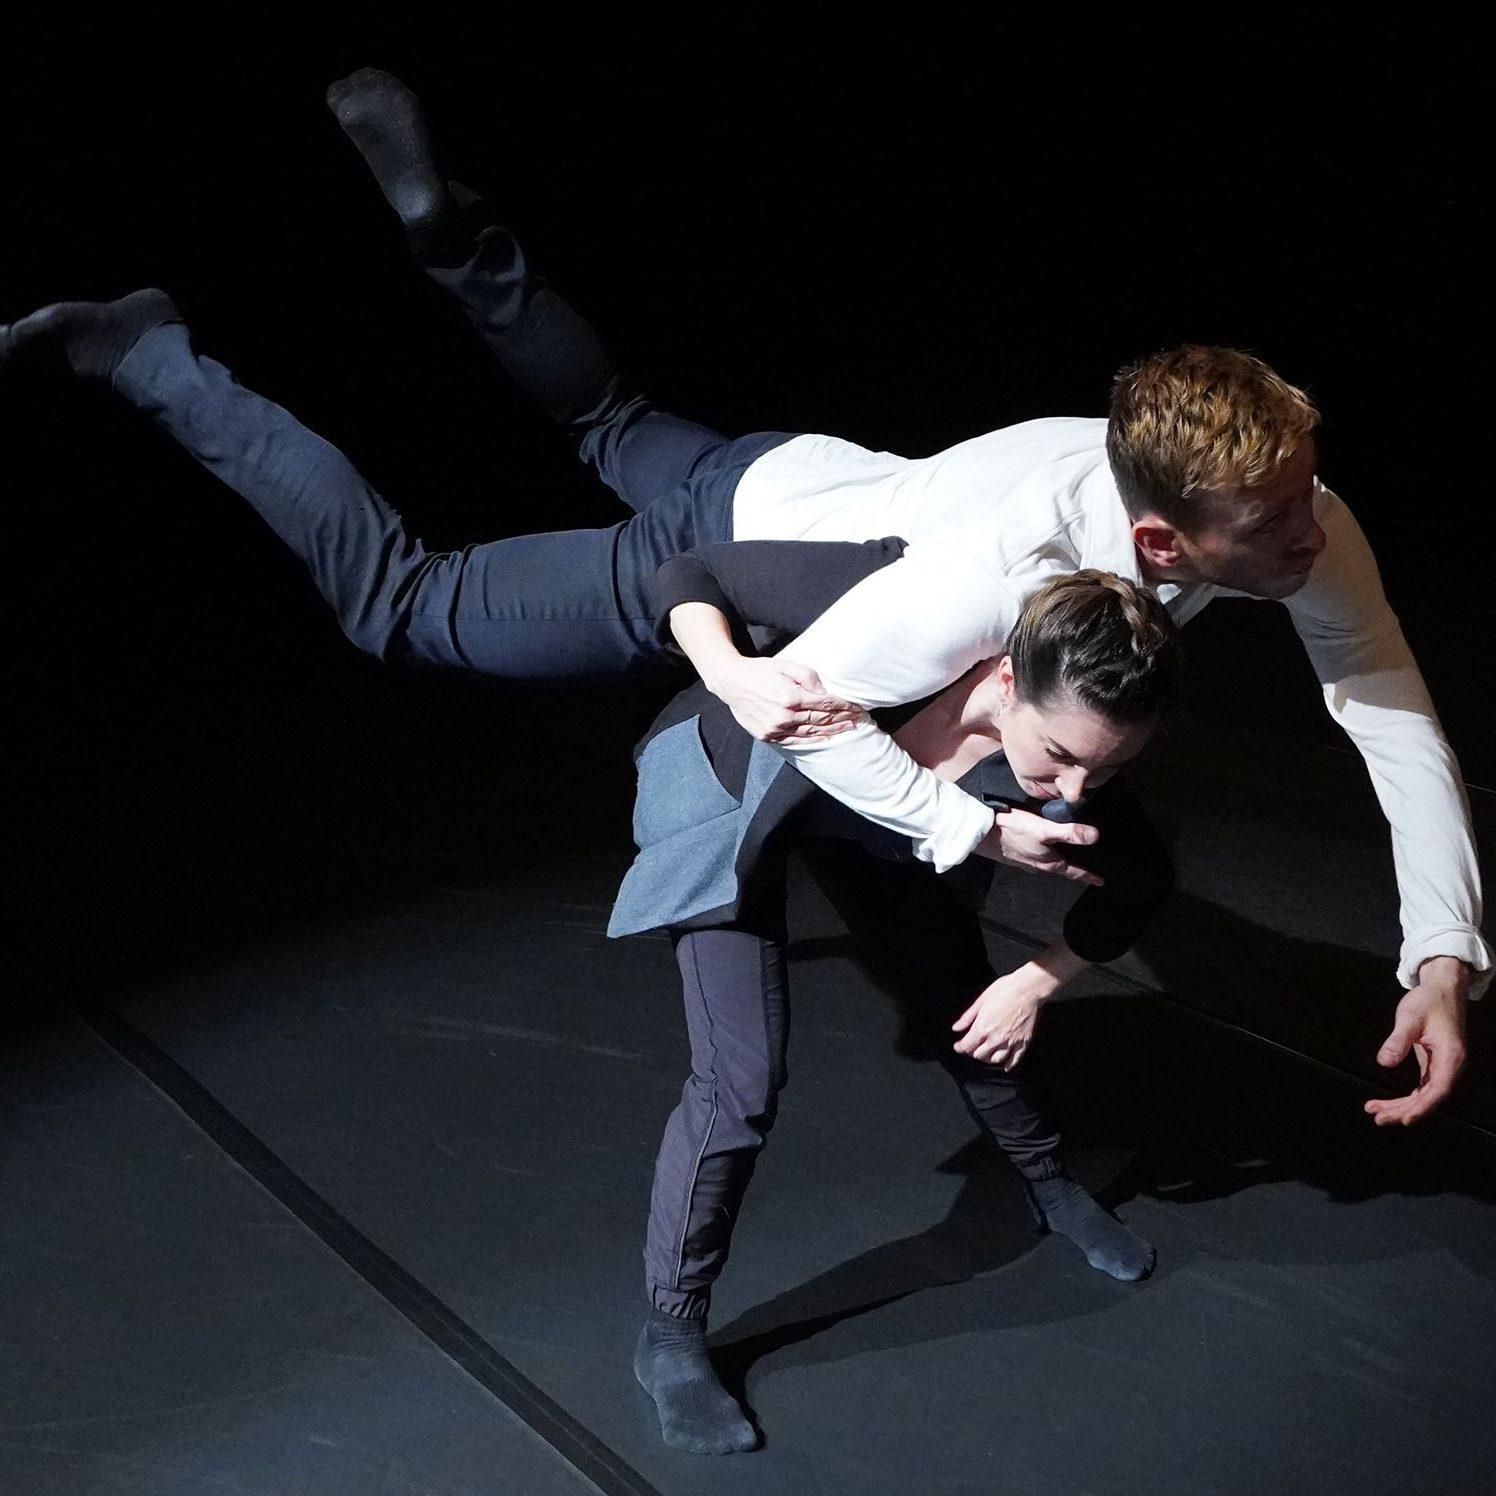 Racheal Prince and Brandon Lee Alley pose mid performance